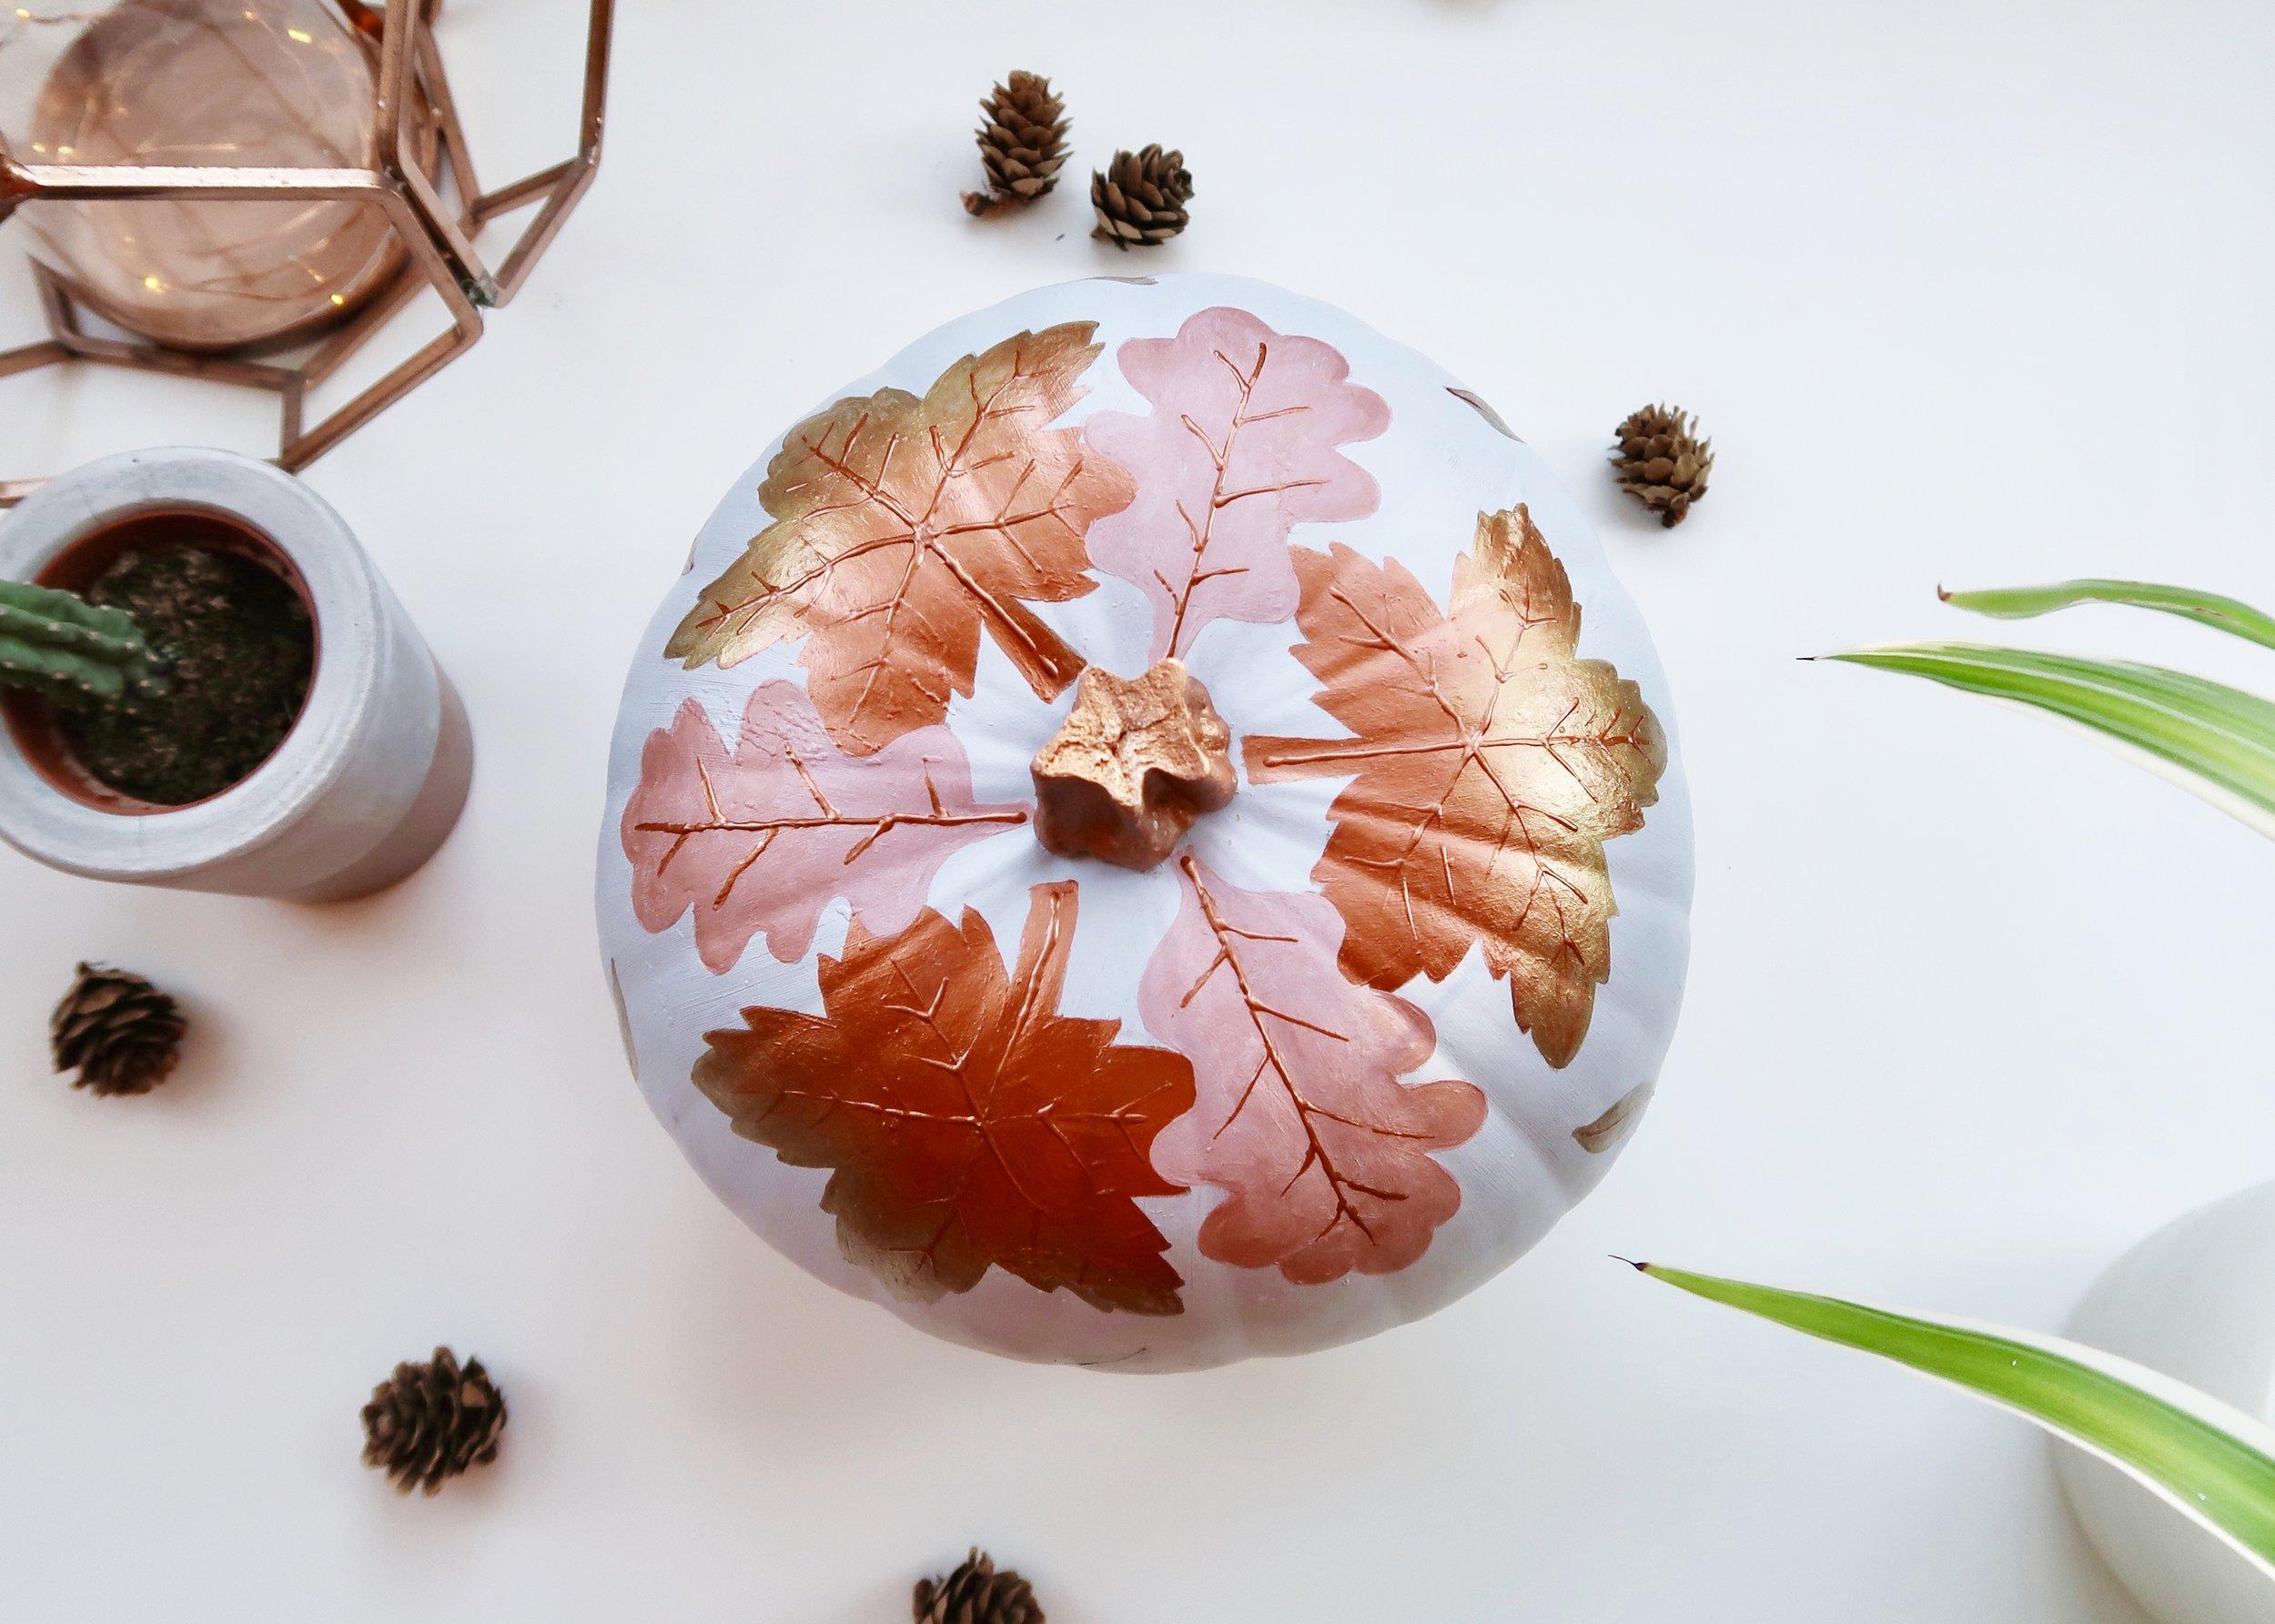 Falling Leaves No-Carve Pumpkin by Isoscella